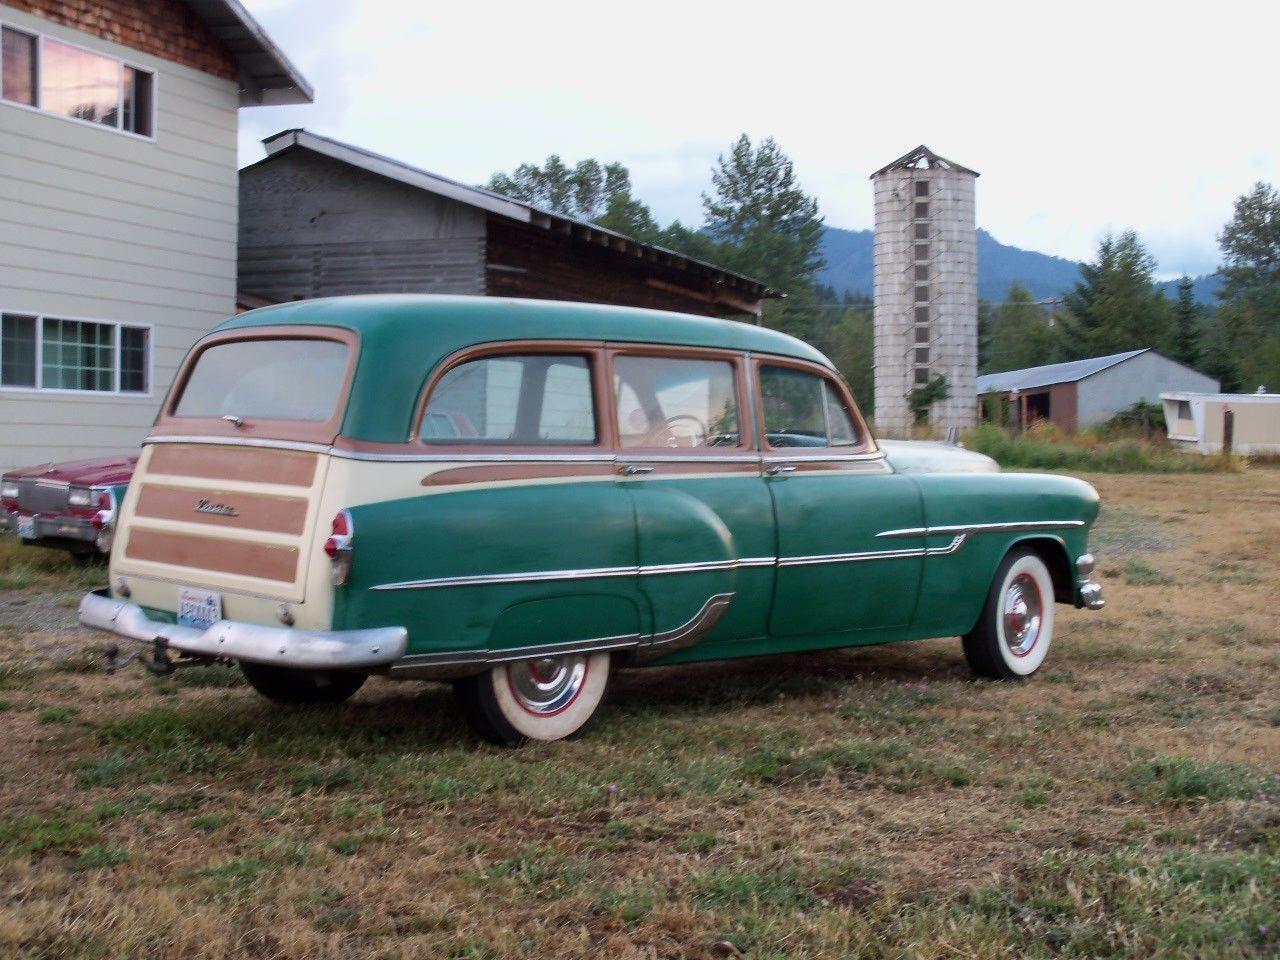 1956 chevrolet belair mjc classic cars pristine -  53 Pontiac Chieftain Tin Woody Station Wagon